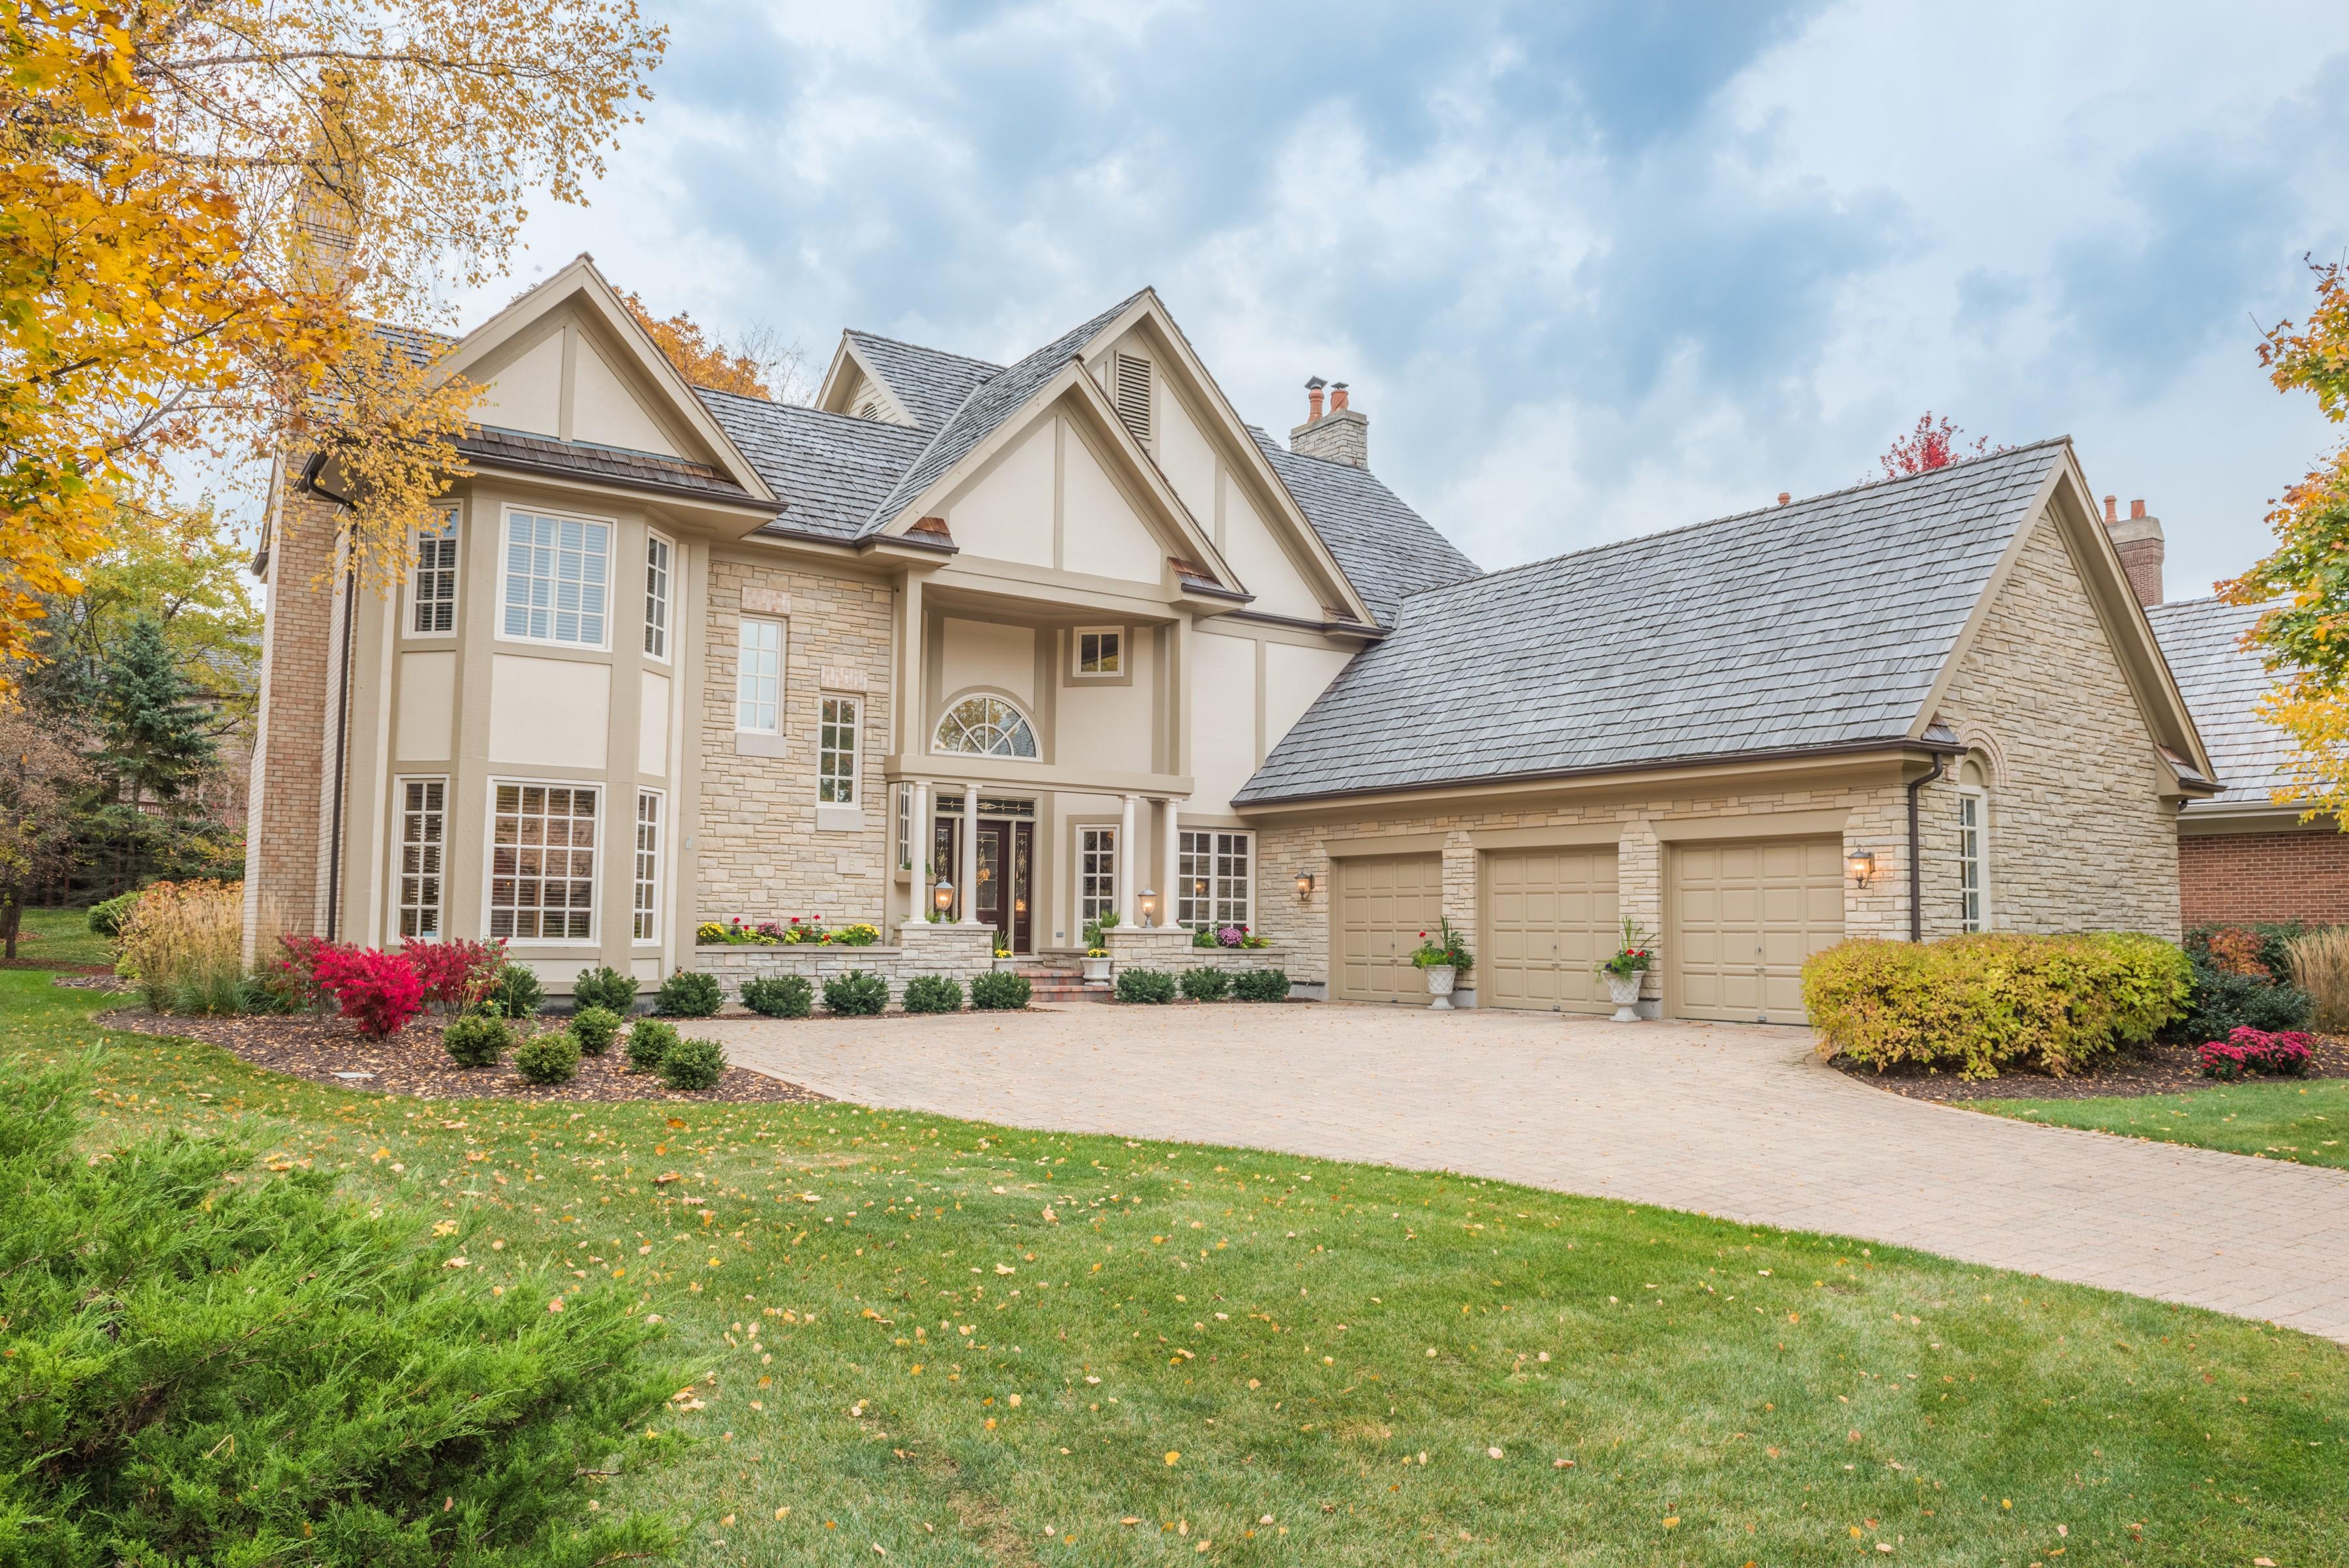 Single Family Home for Sale at 6 Graystone Court Wynstone North Barrington North Barrington, Illinois 60010 United States